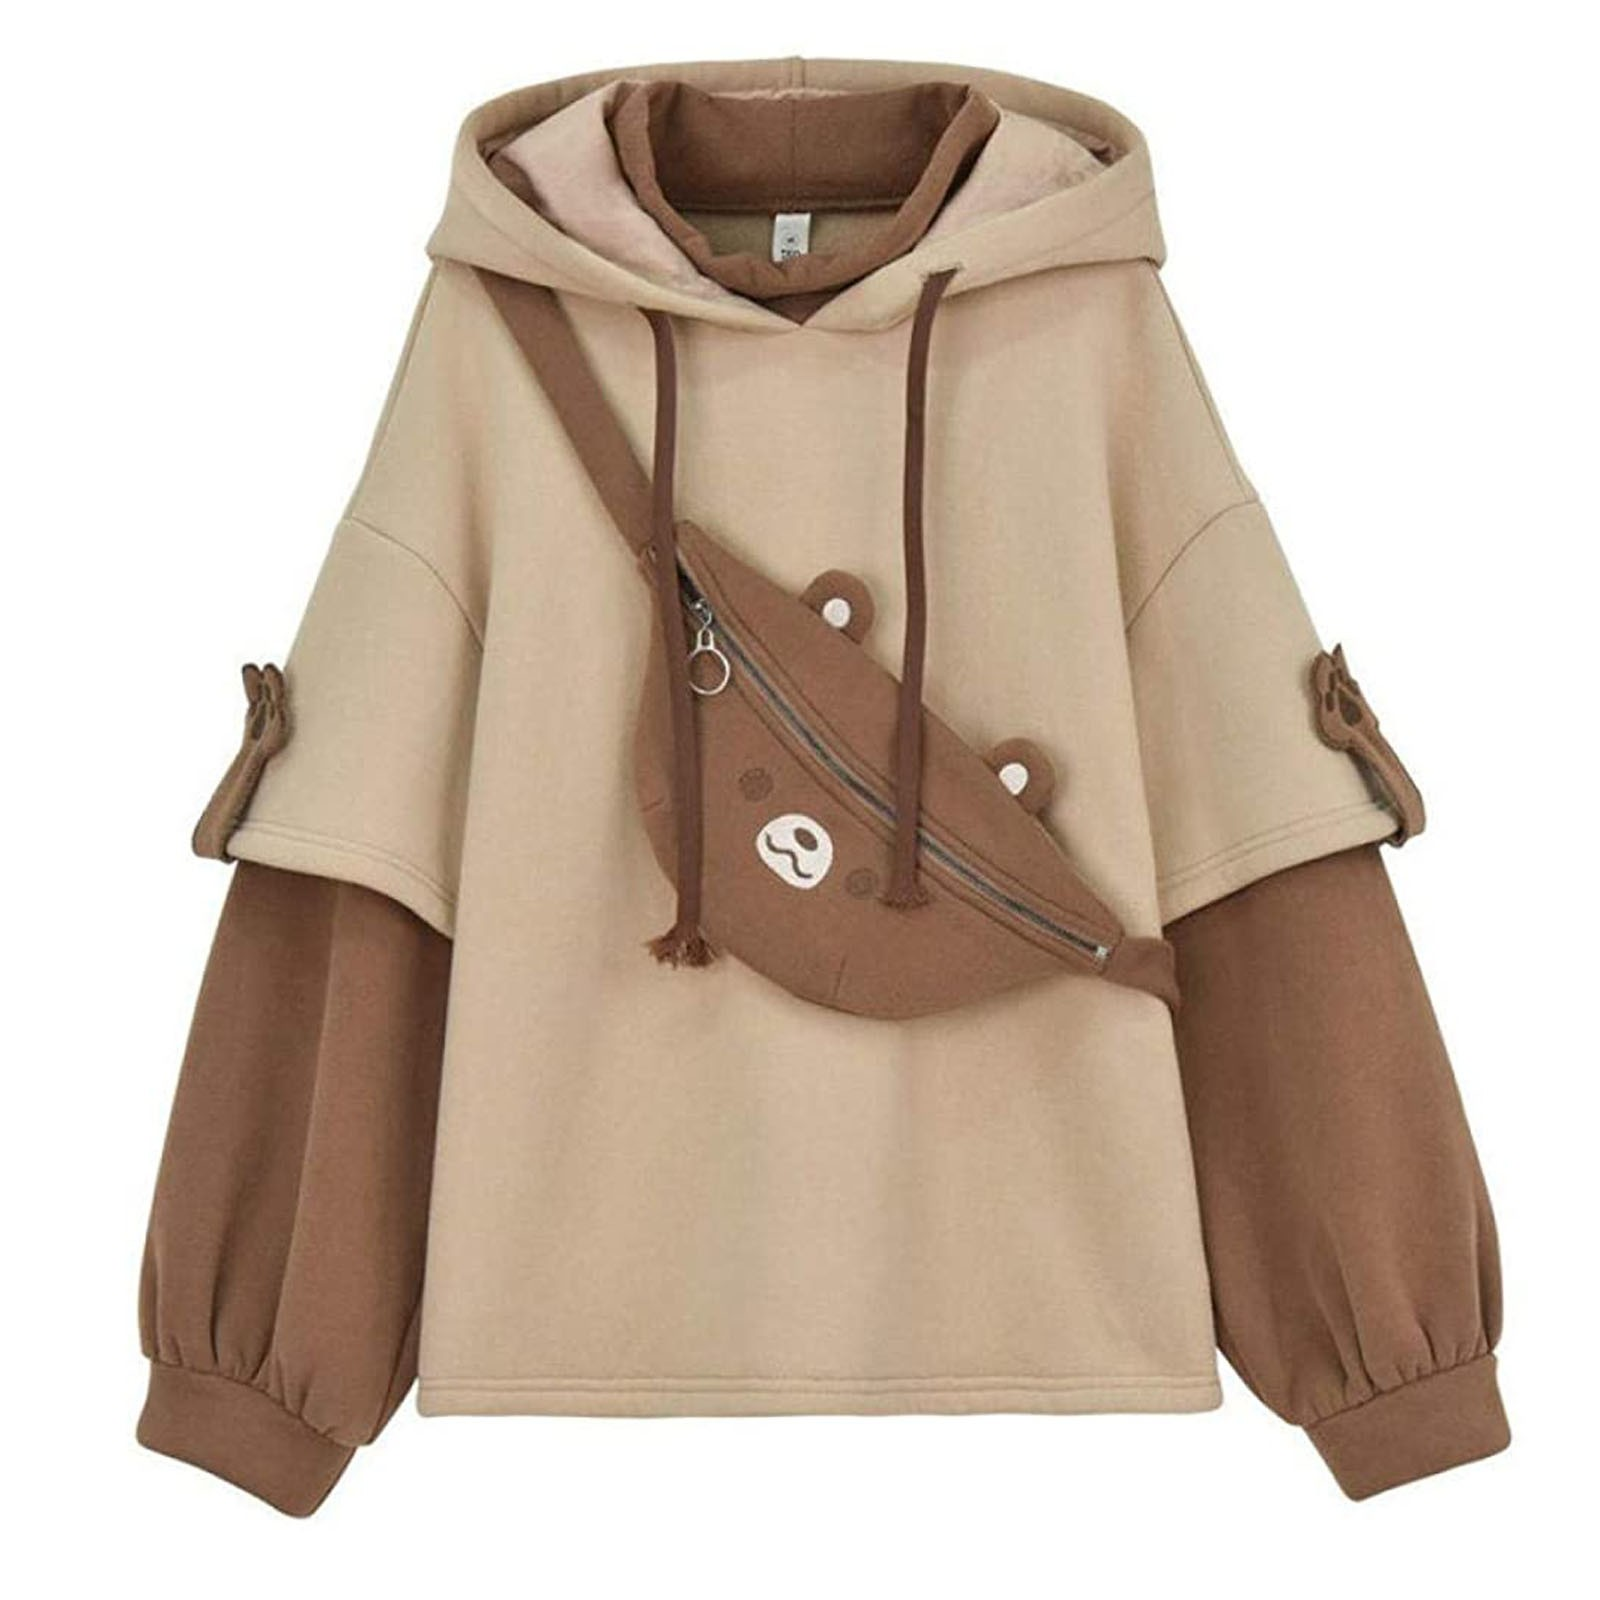 harajuku aesthetic bear anime hoodie women korean kawaii crewneck long sleeve oversized fall winter clothes kpop streetwear tops 11